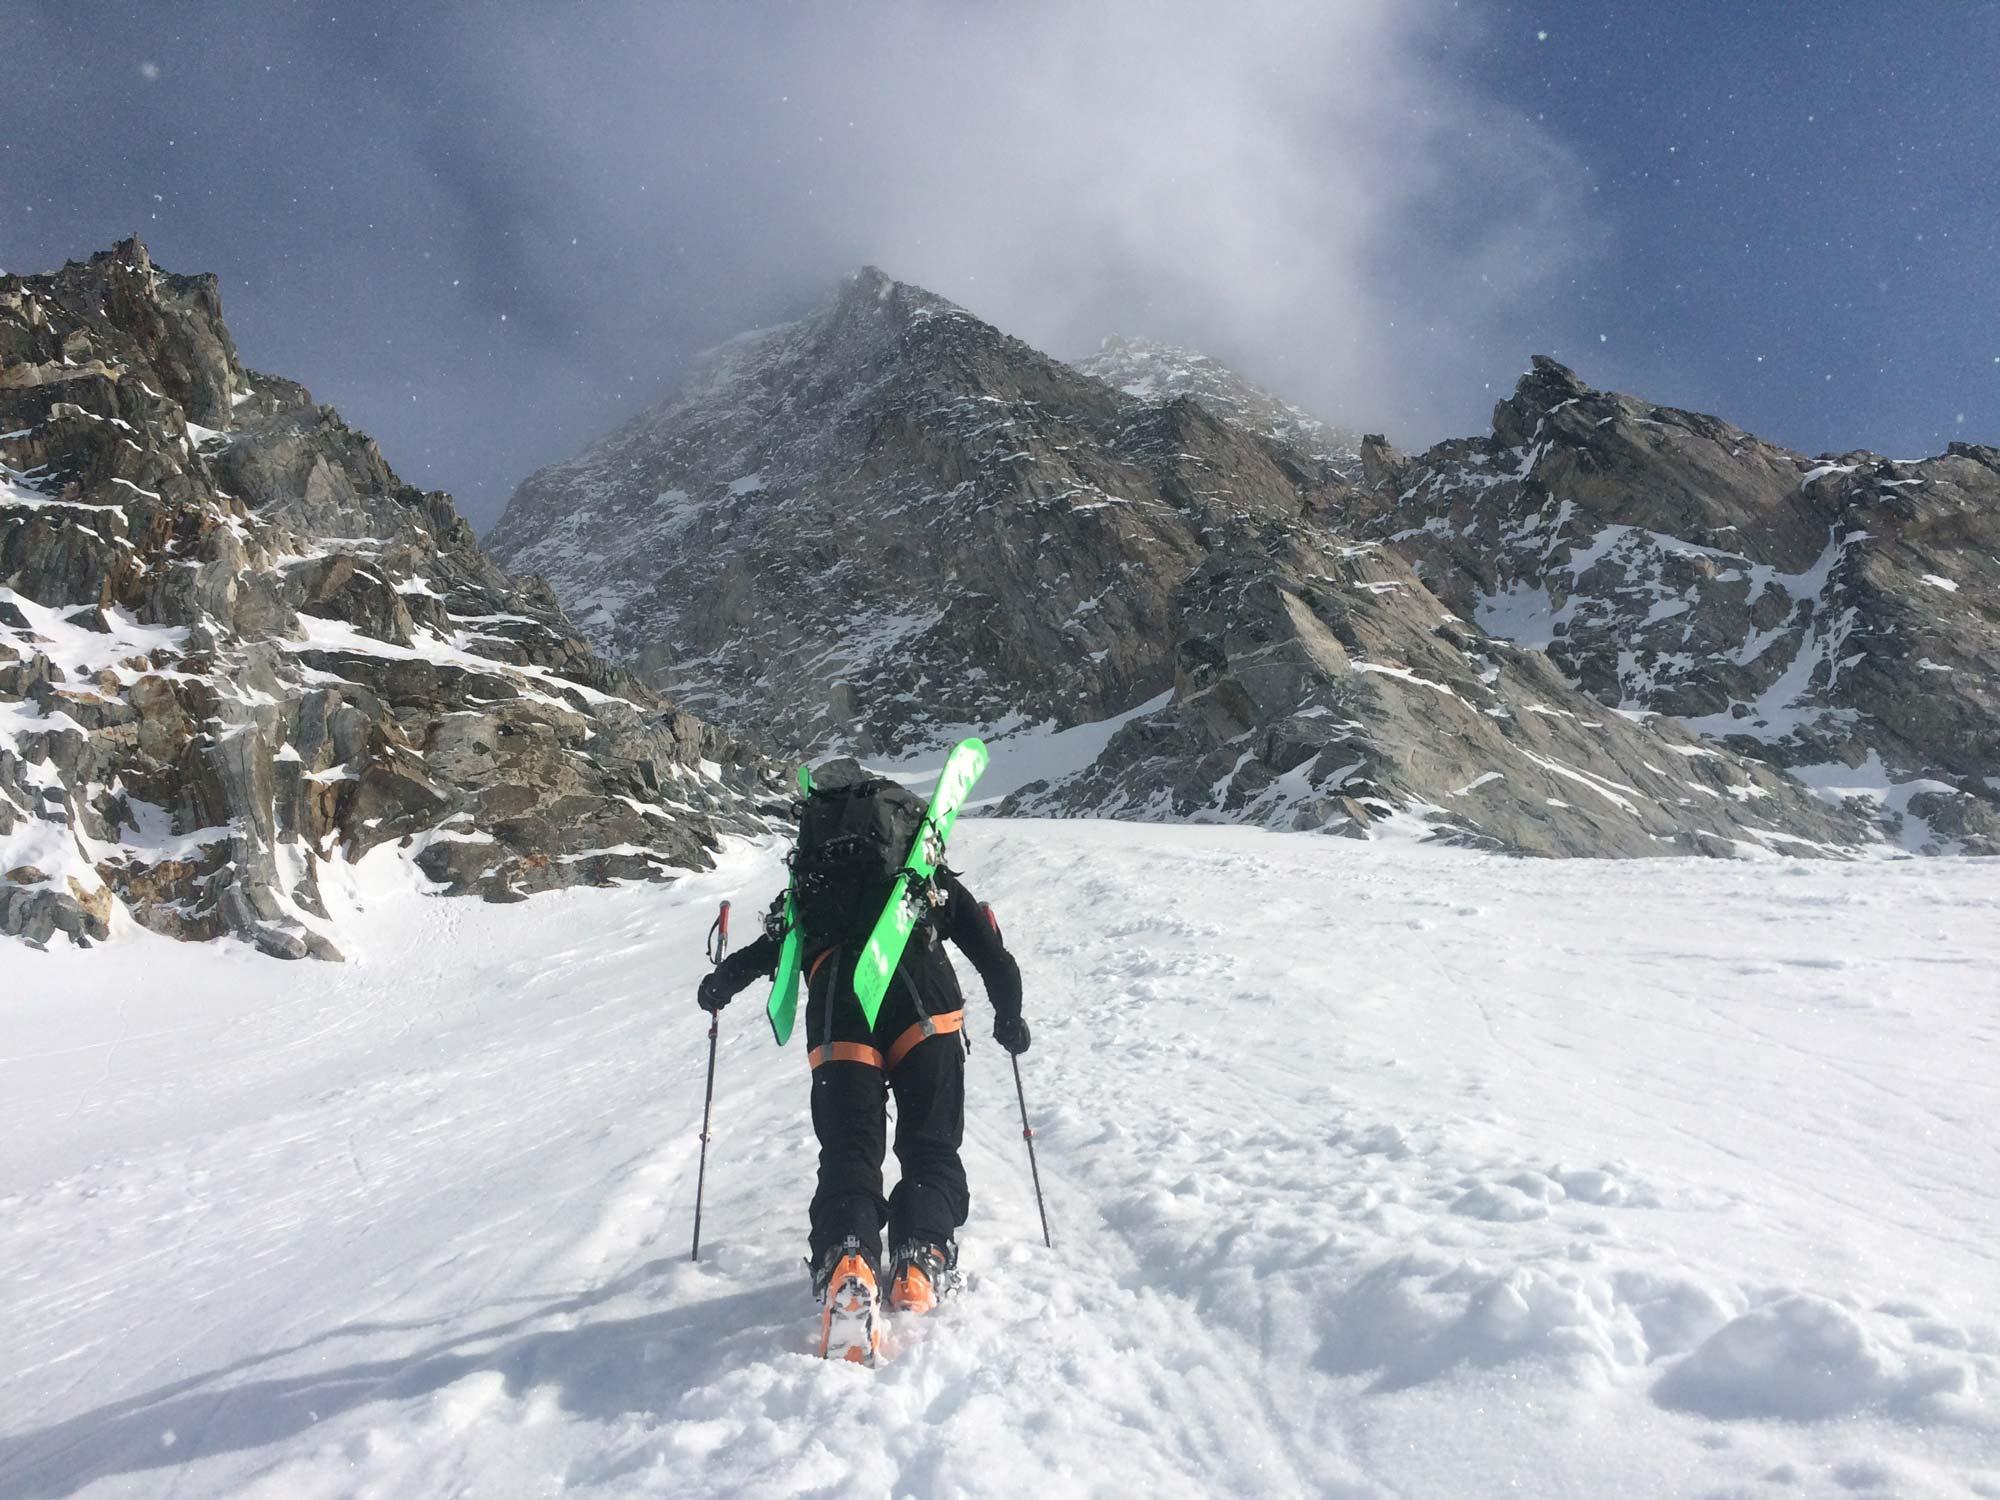 east-greenland-ski-expedition-7.jpg